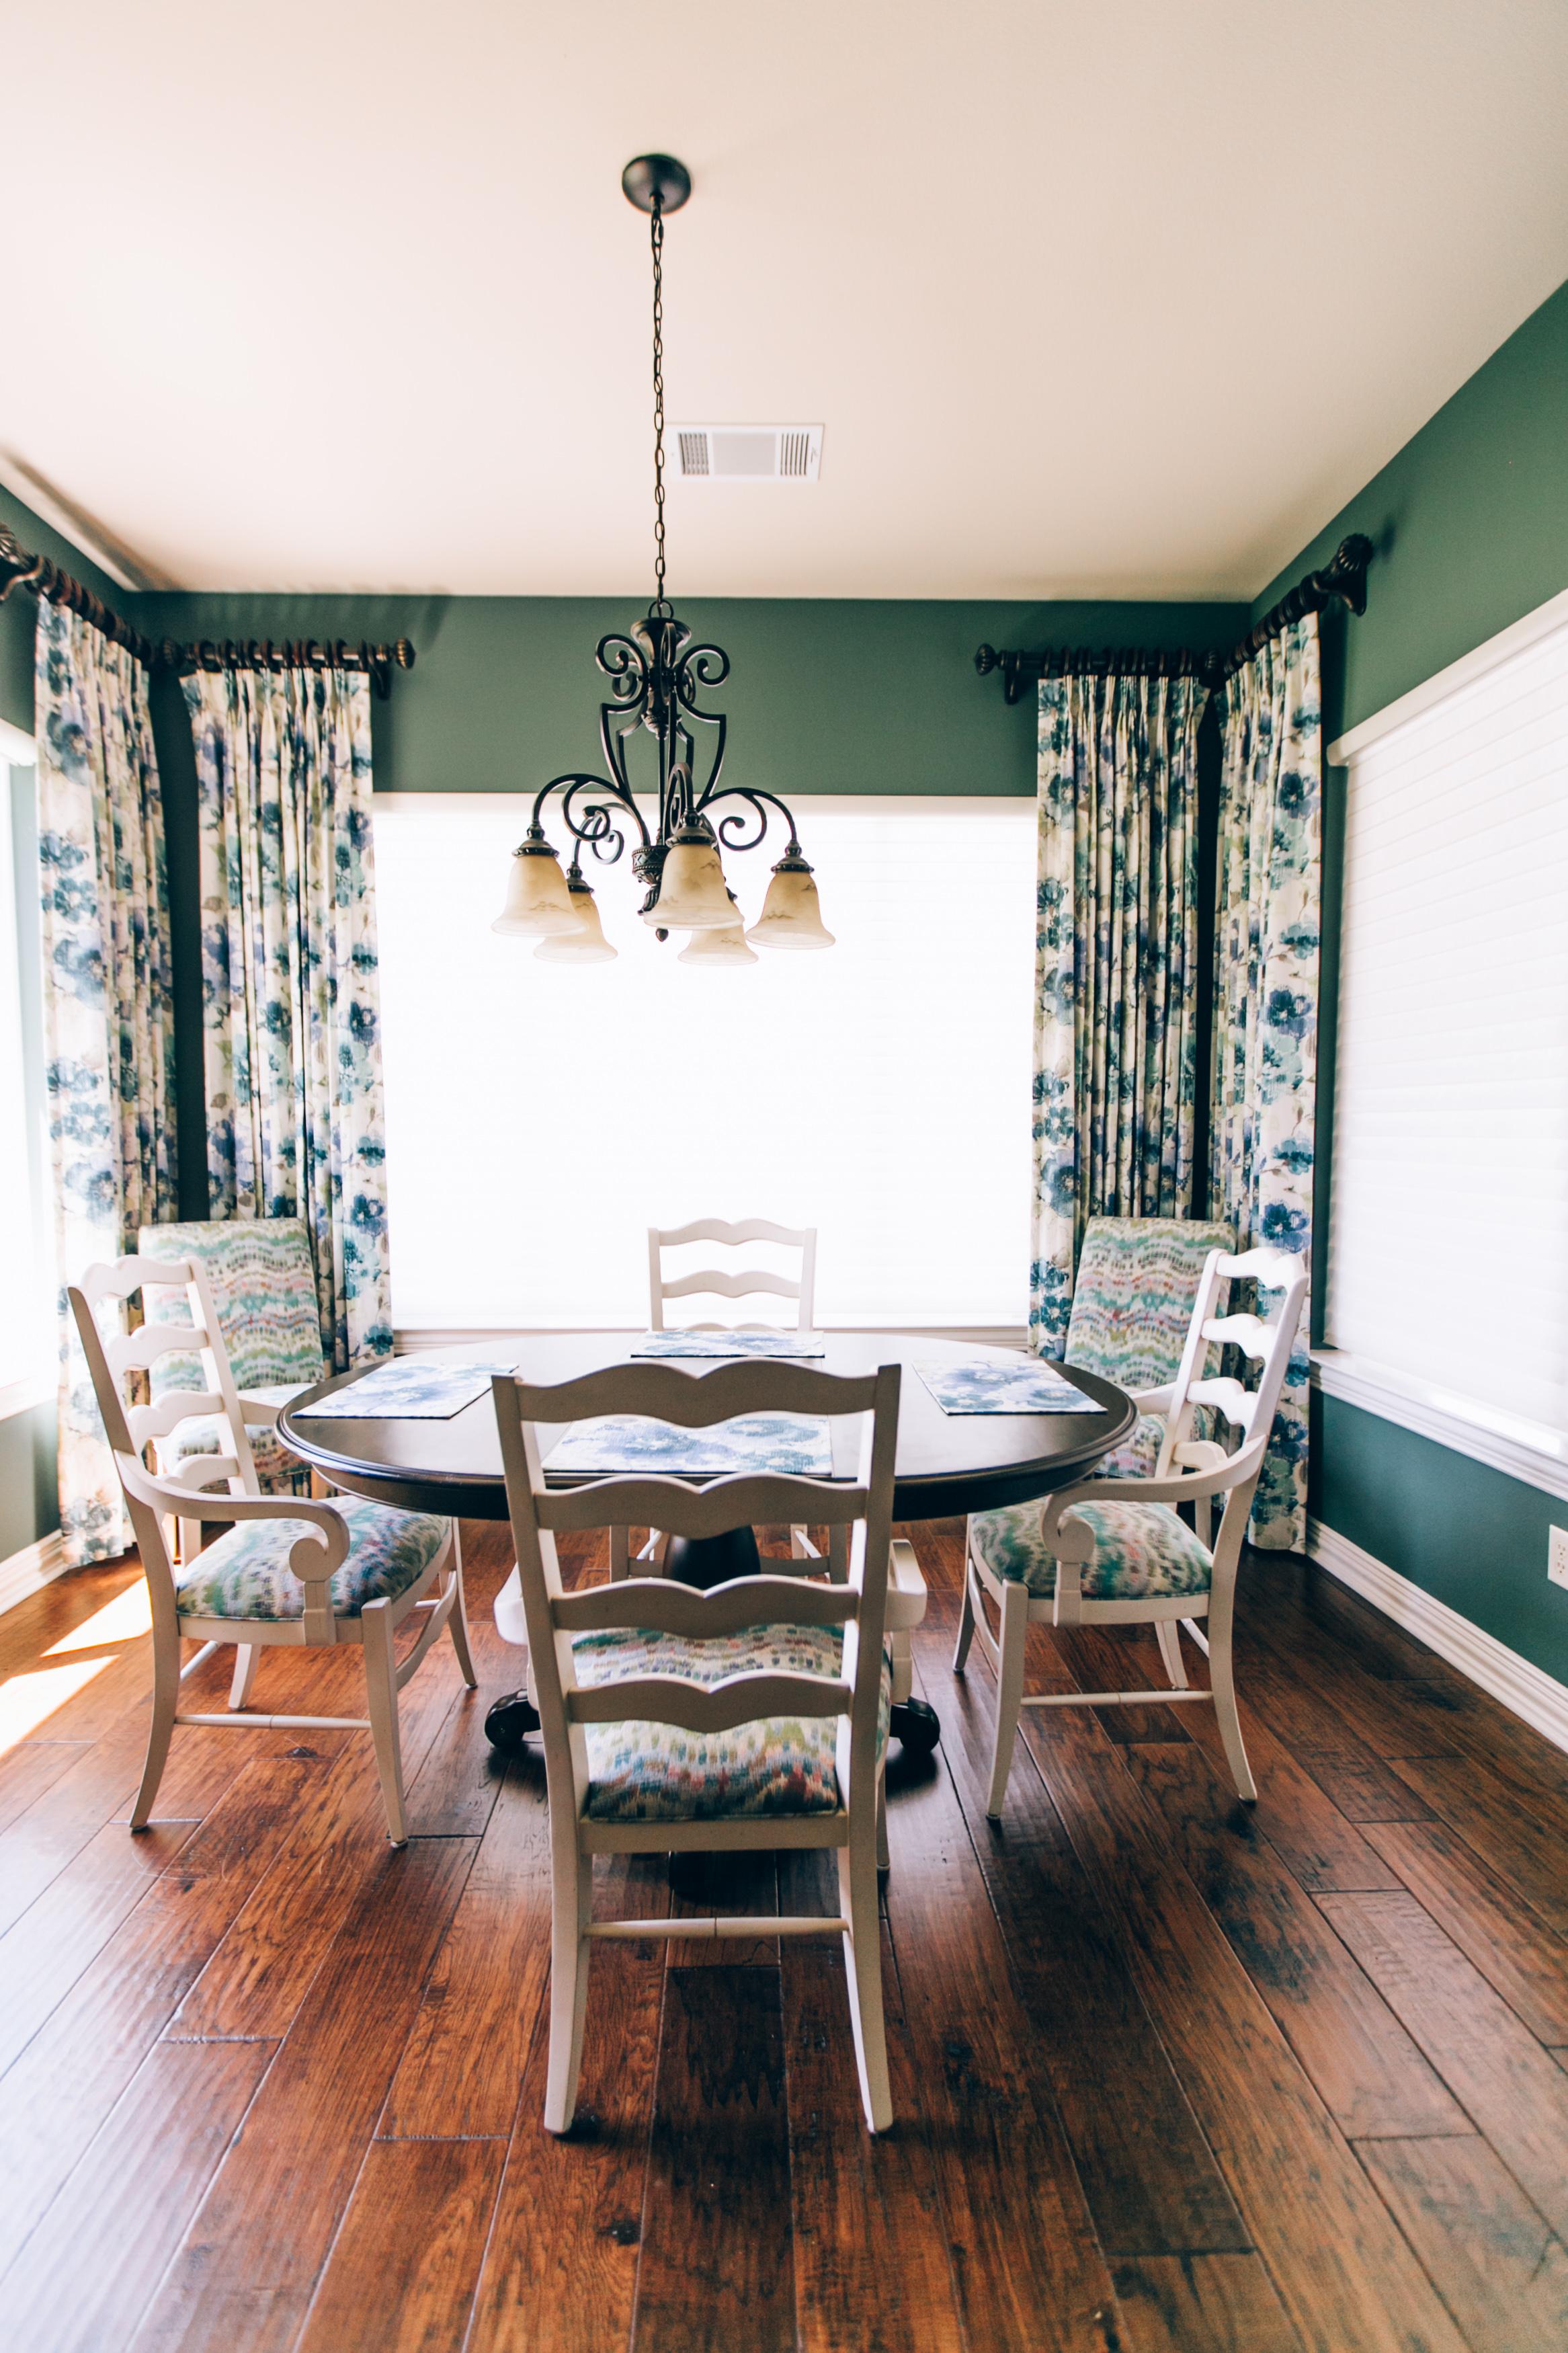 Interior-design-home-decorating-280.jpg